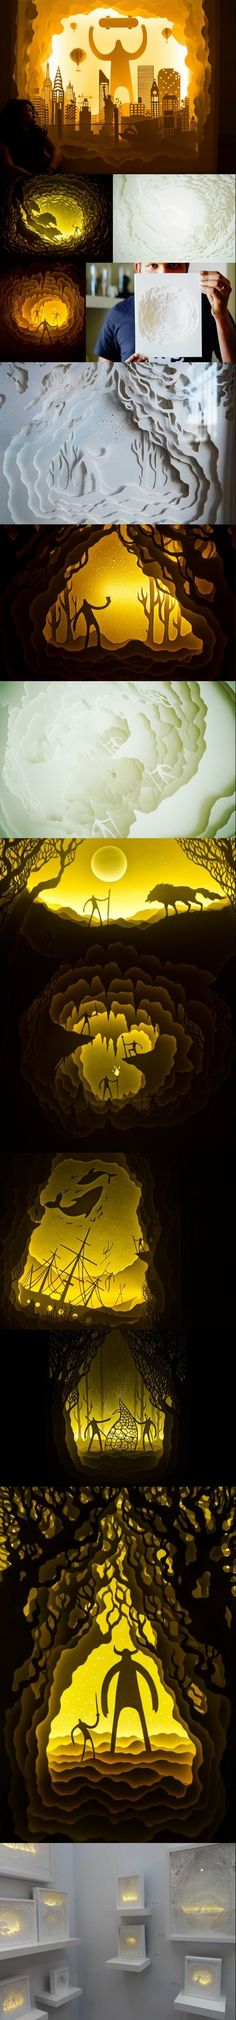 Beautiful illuminated paper cut light box dioramas